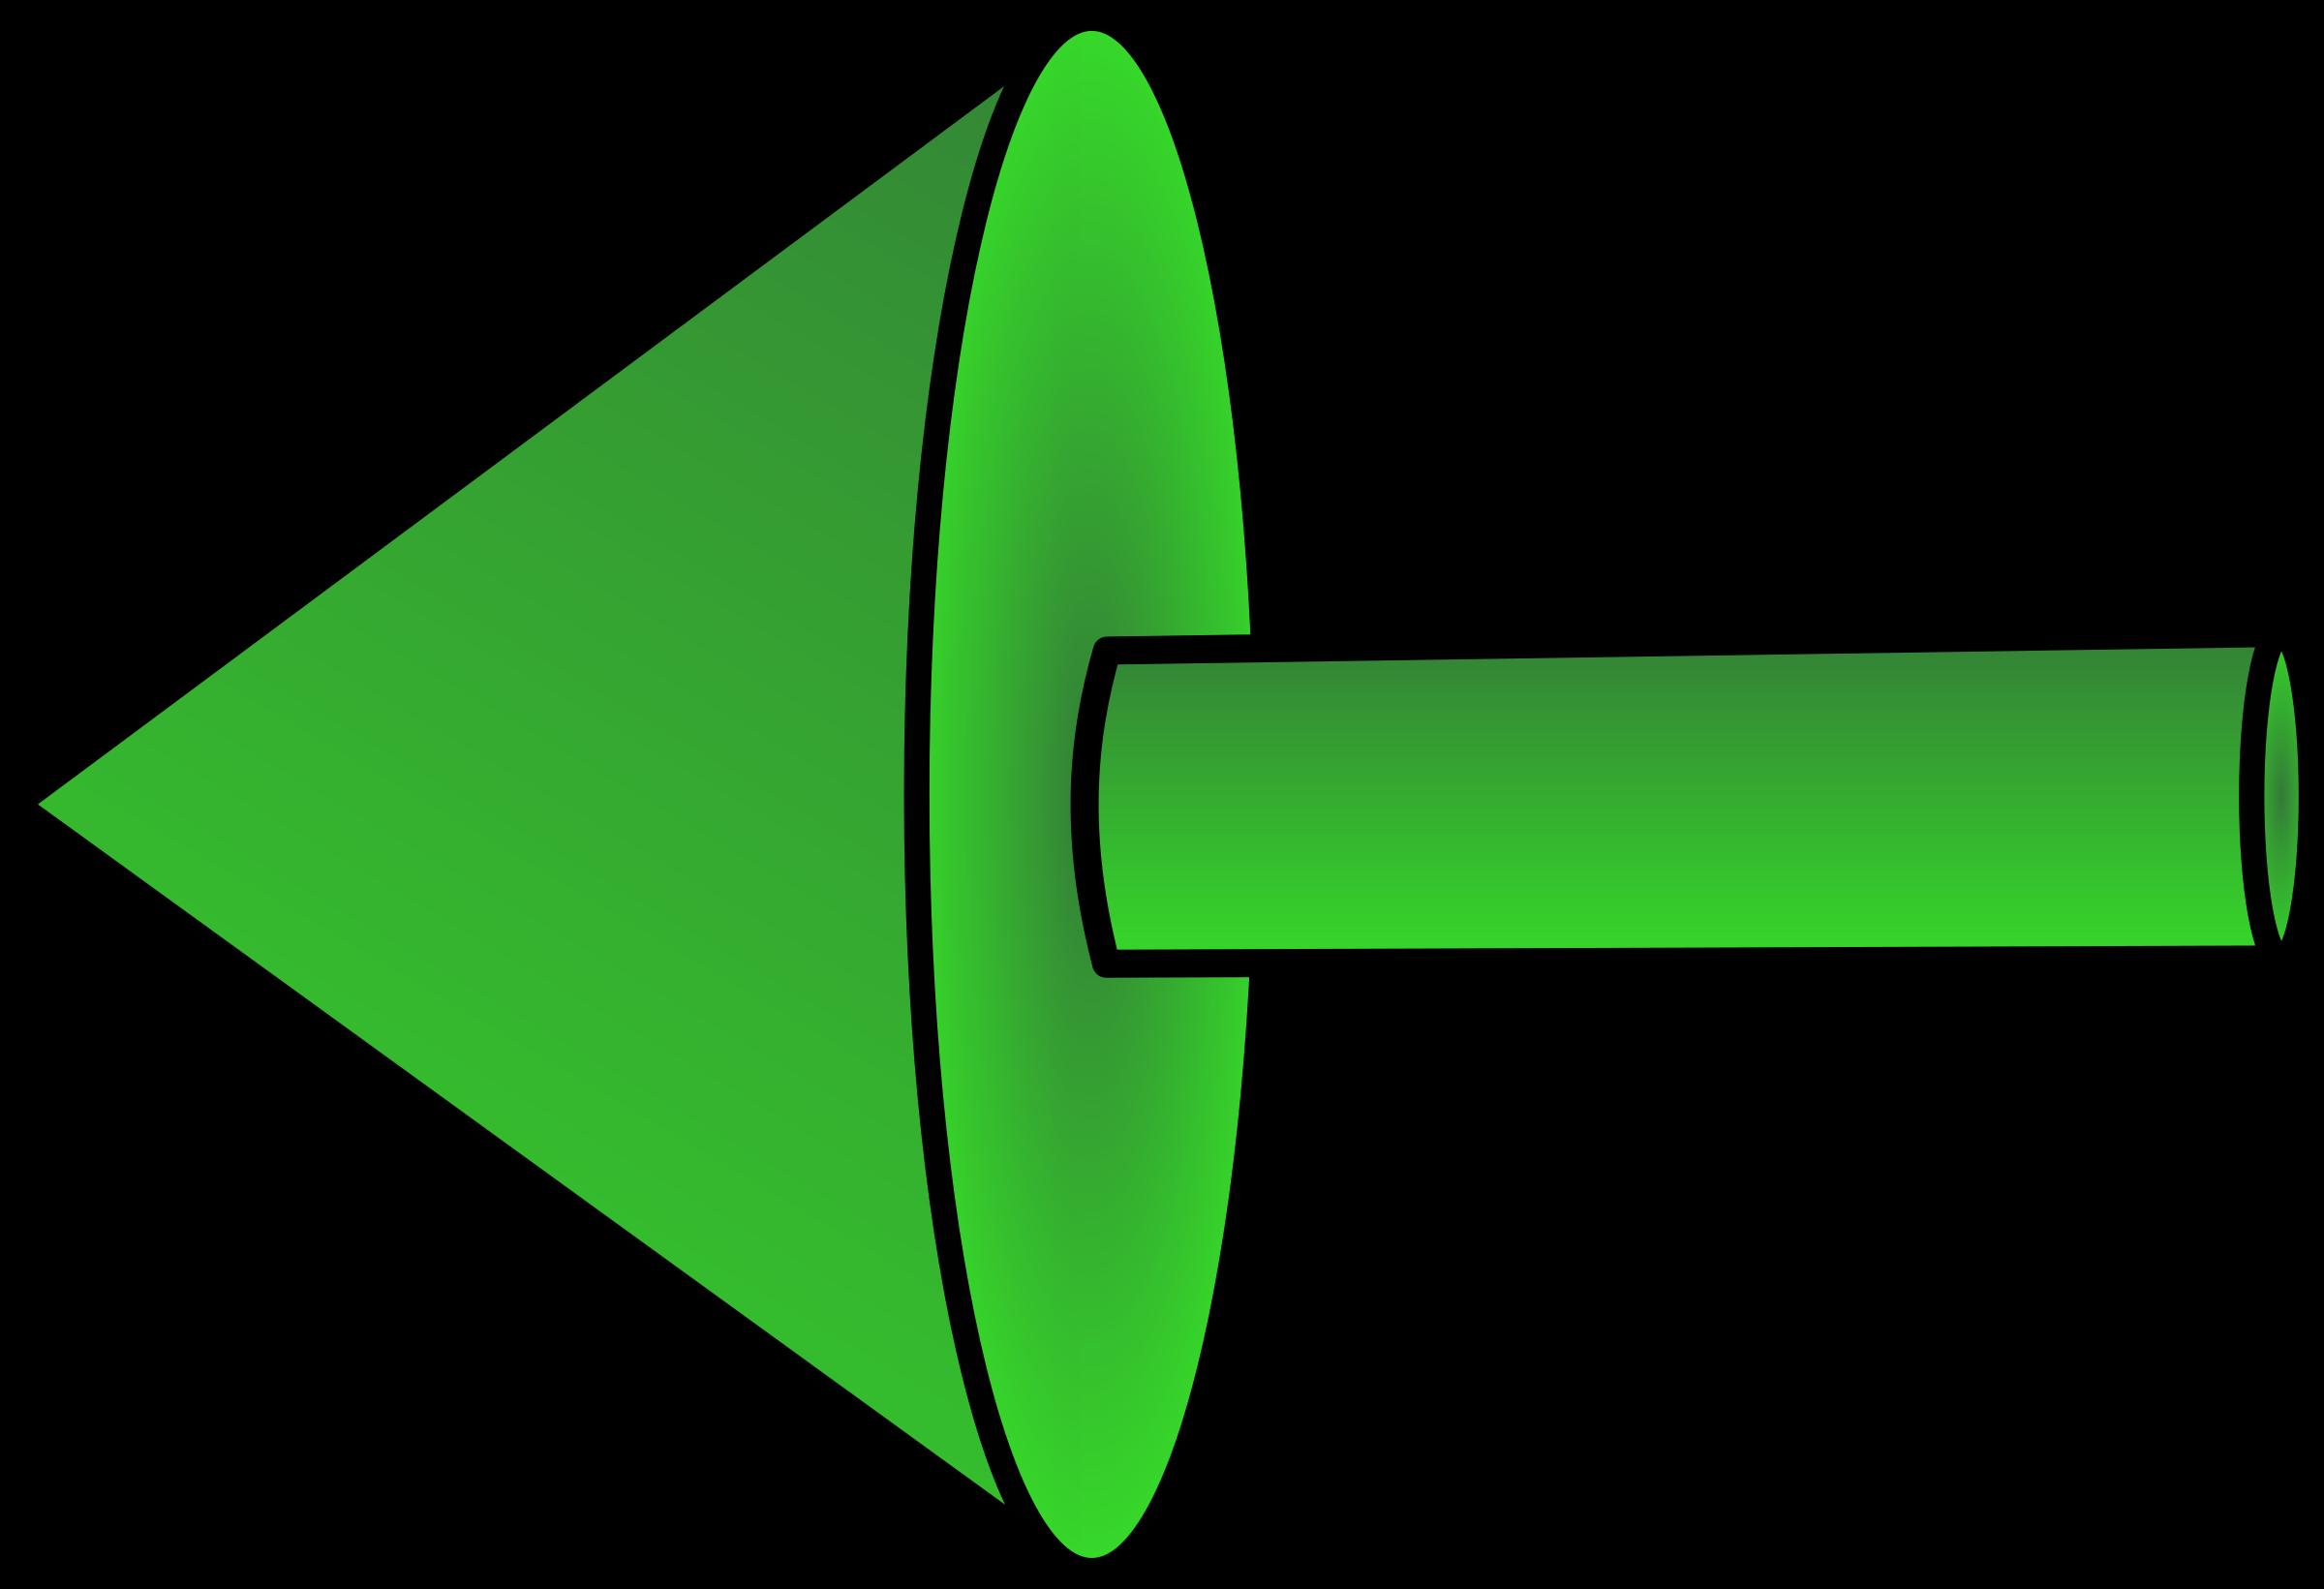 Block arrow clip art picture transparent download Clipart - 3d arrow left picture transparent download